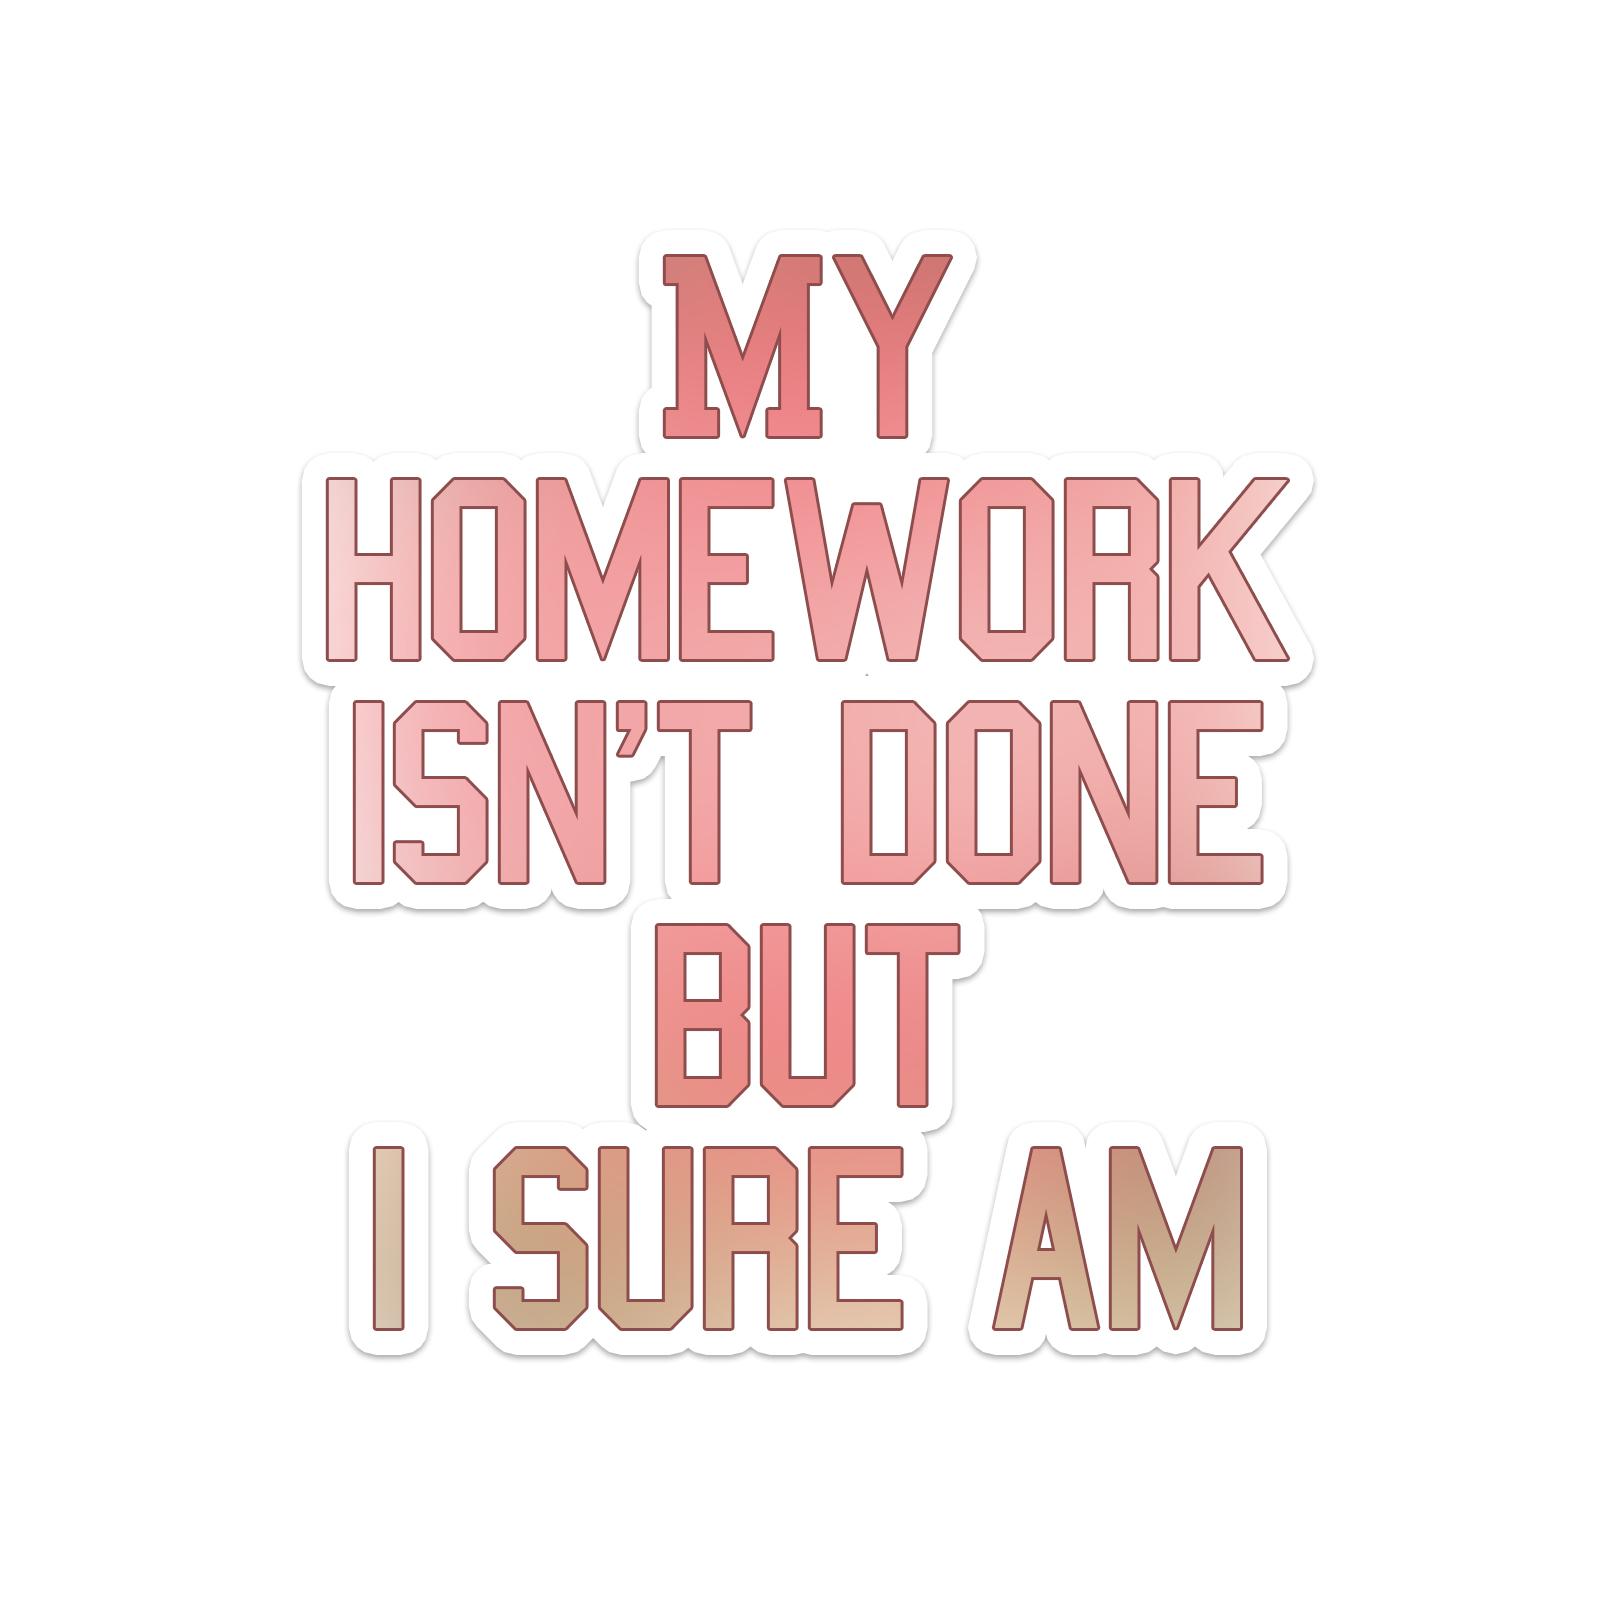 Can i do my homework on a tablet